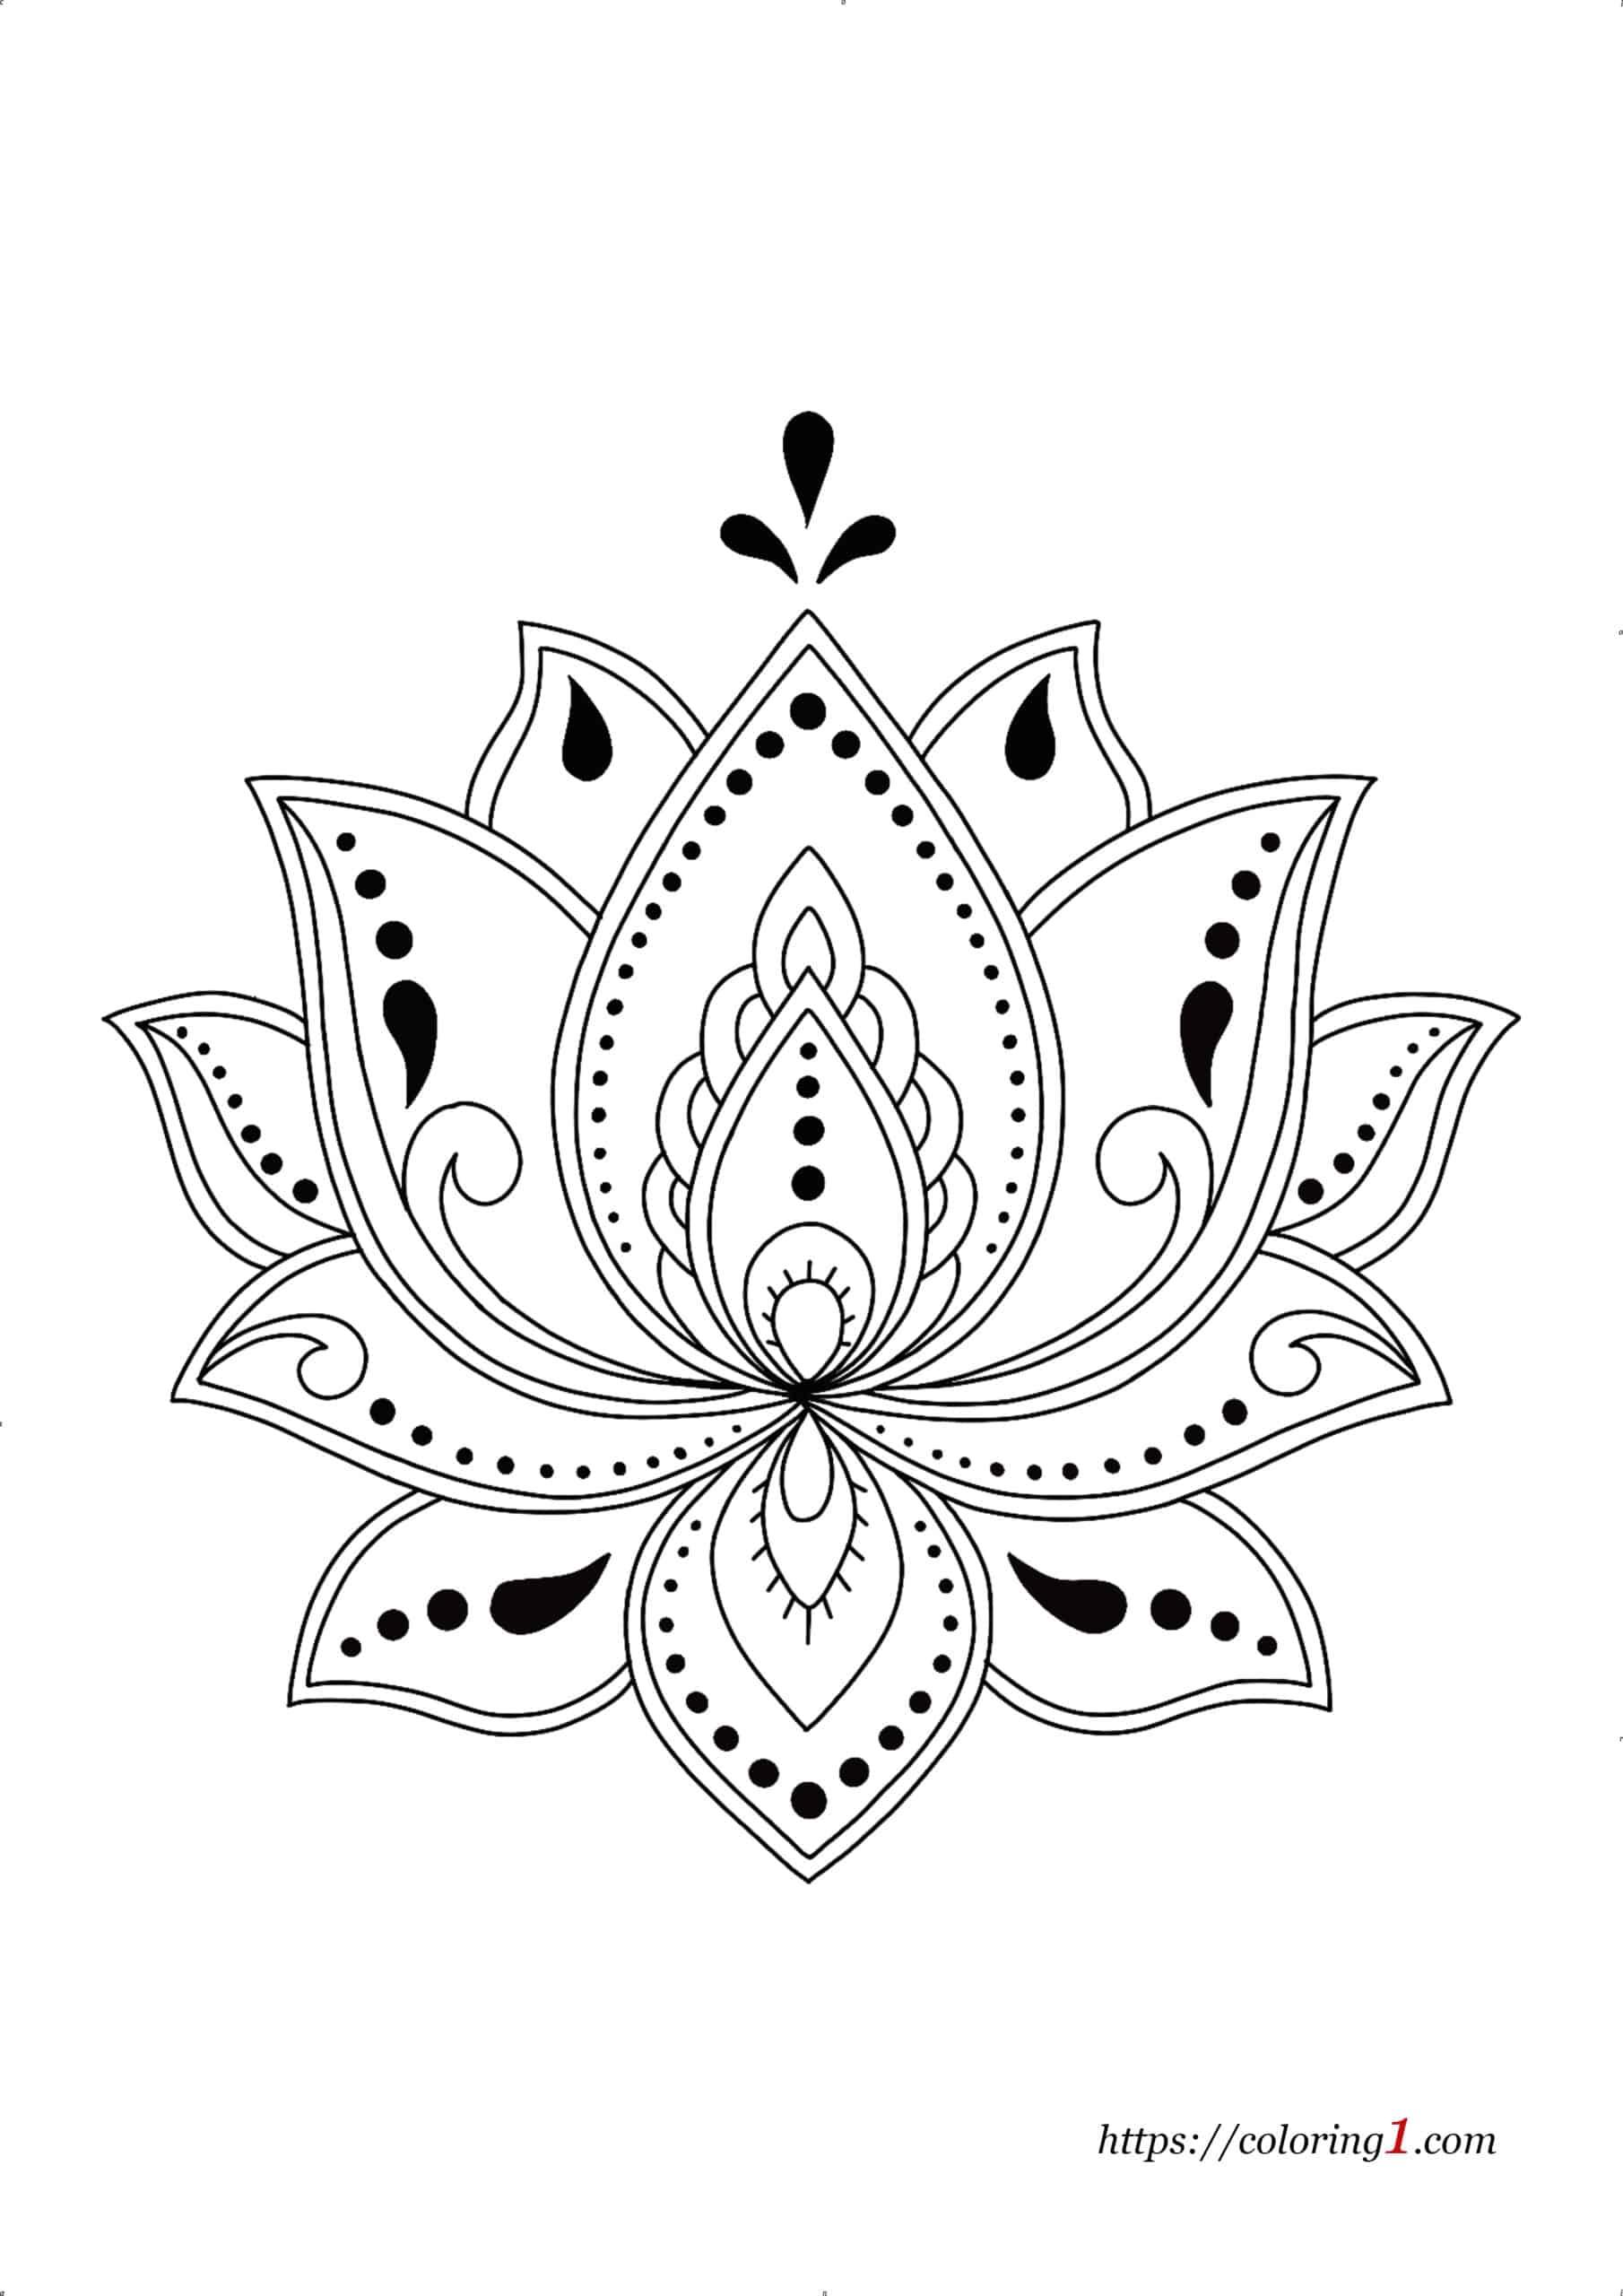 Coloriage Dessin Difficile Mandala Fleur De Lotus